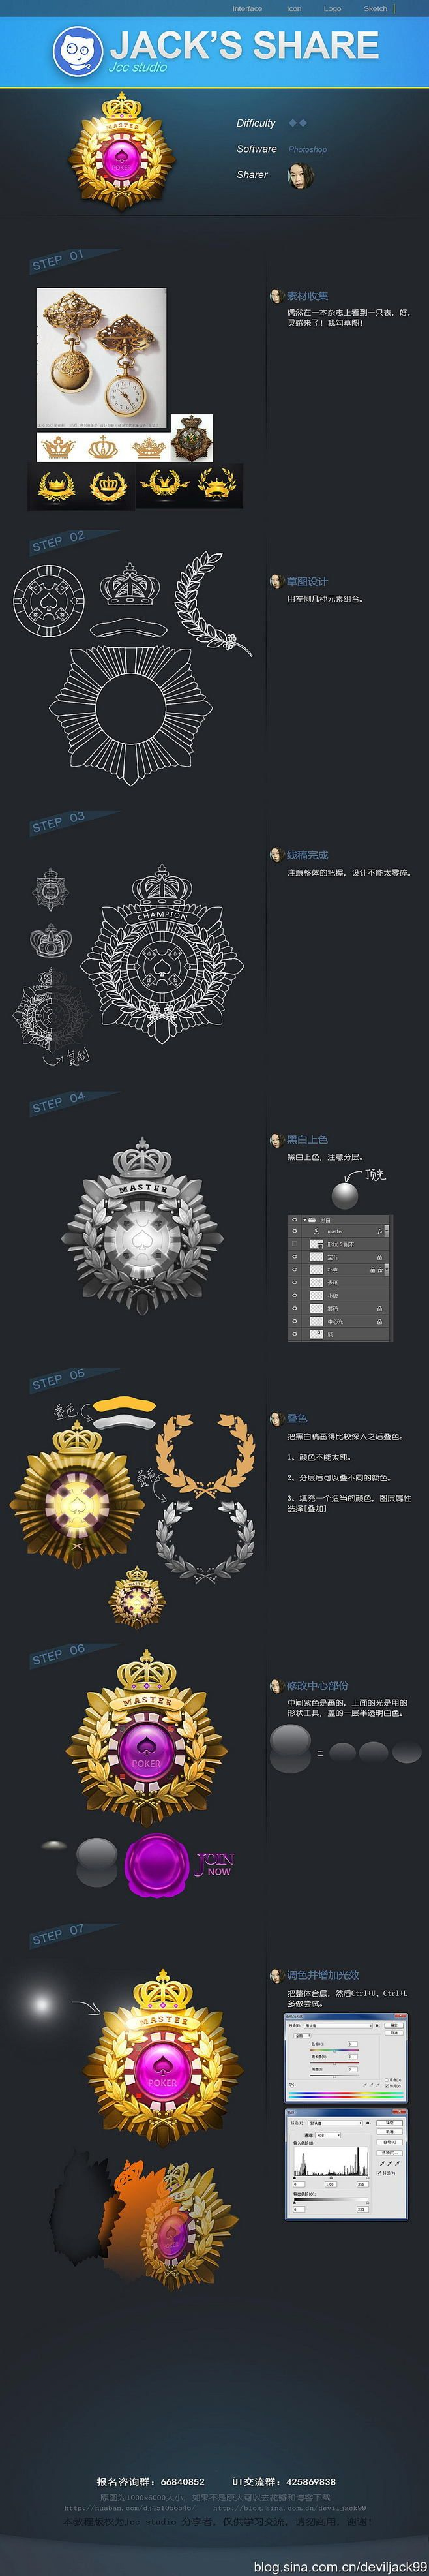 Jack UI-class /game ui/游戏UI/设计/图标/界面交互/游戏设计/平面/手游/资源/App/icon/logo/GUI/UE//UI控件/ui资源/游戏教程/徽章/游戏按钮/ui/教程 微博:http://weibo.com/u/2796854547   优酷:http://i.youku.com/Deviljack99  素材 博客:http://blog.sina.com.cn/deviljack99